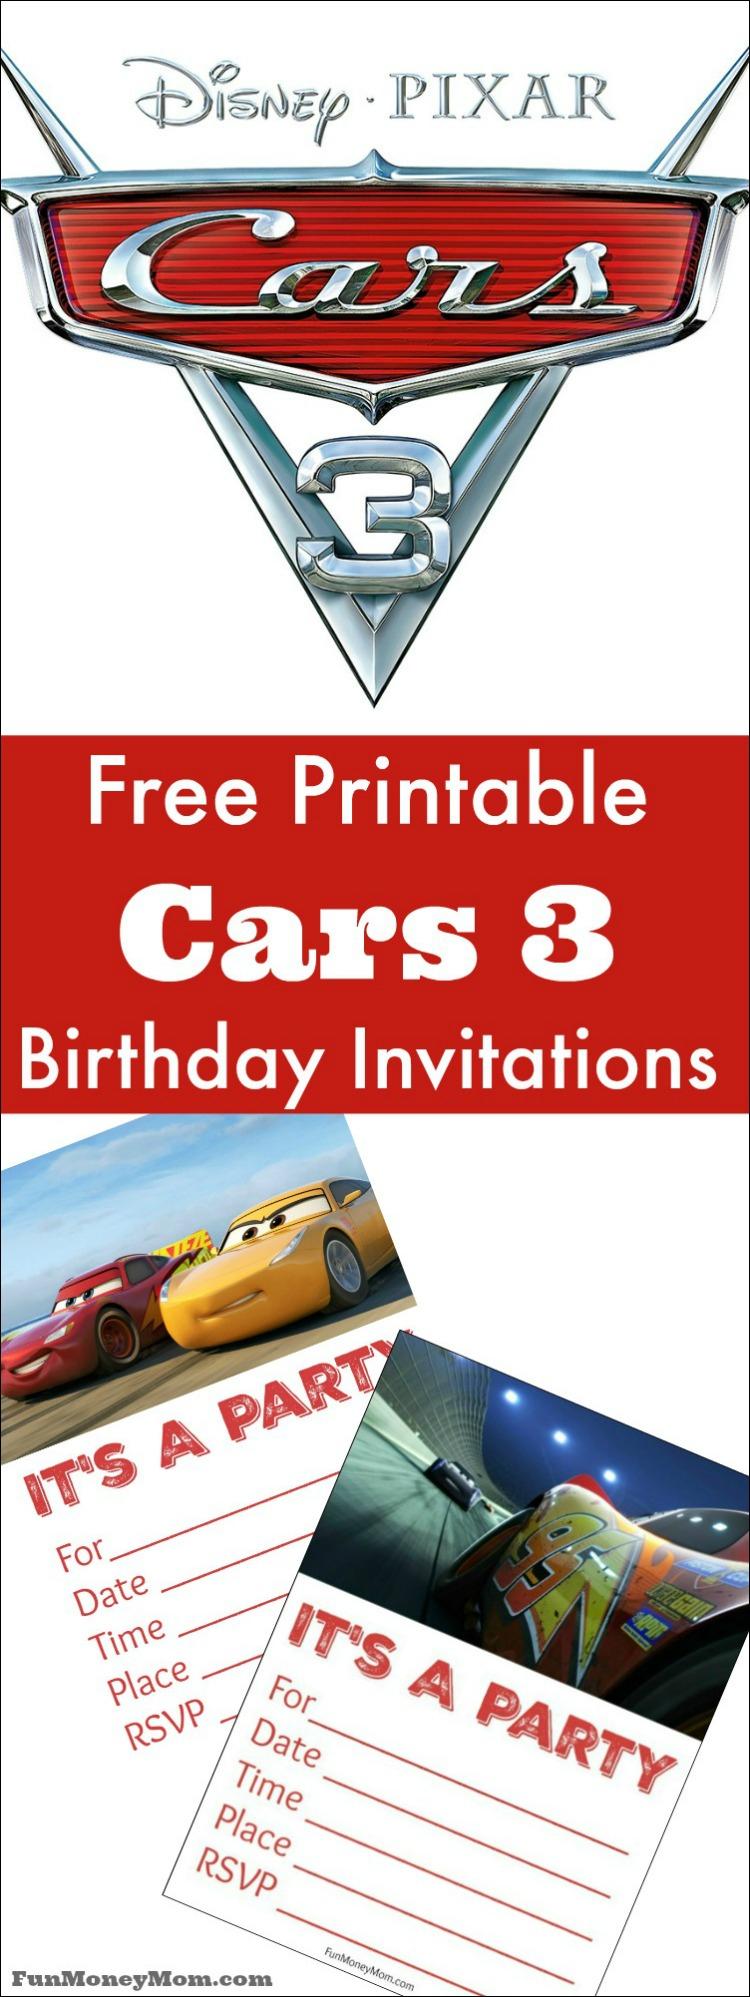 Free Printable Cars Birthday Invitations - Fun Money Mom - Free Printable Birthday Invitations Cars Theme